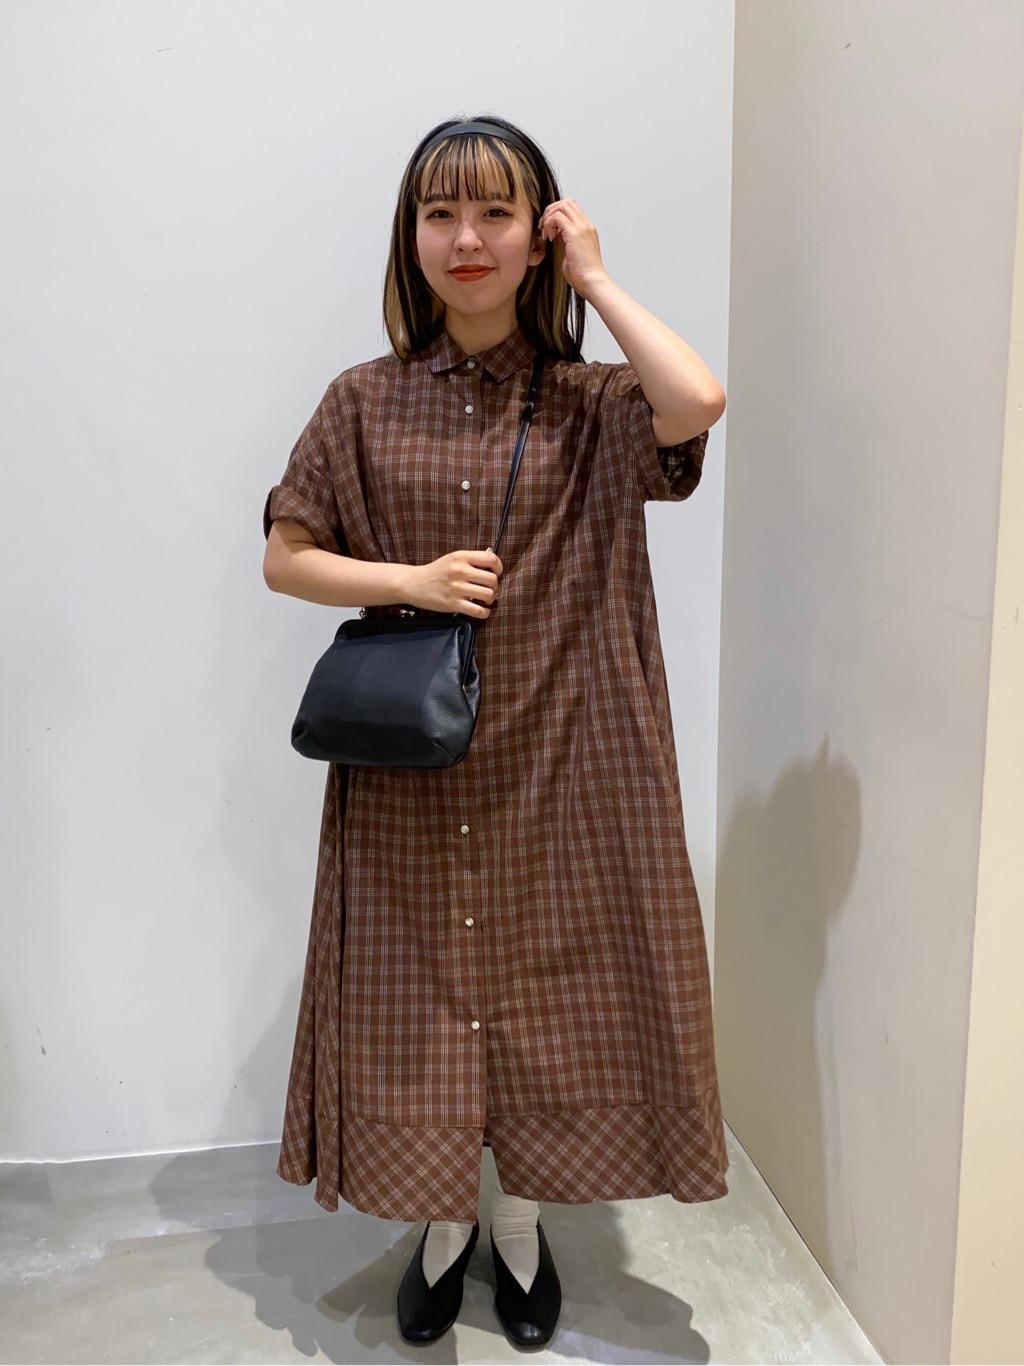 bulle de savon 阪急西宮ガーデンズ 身長:150cm 2020.08.26